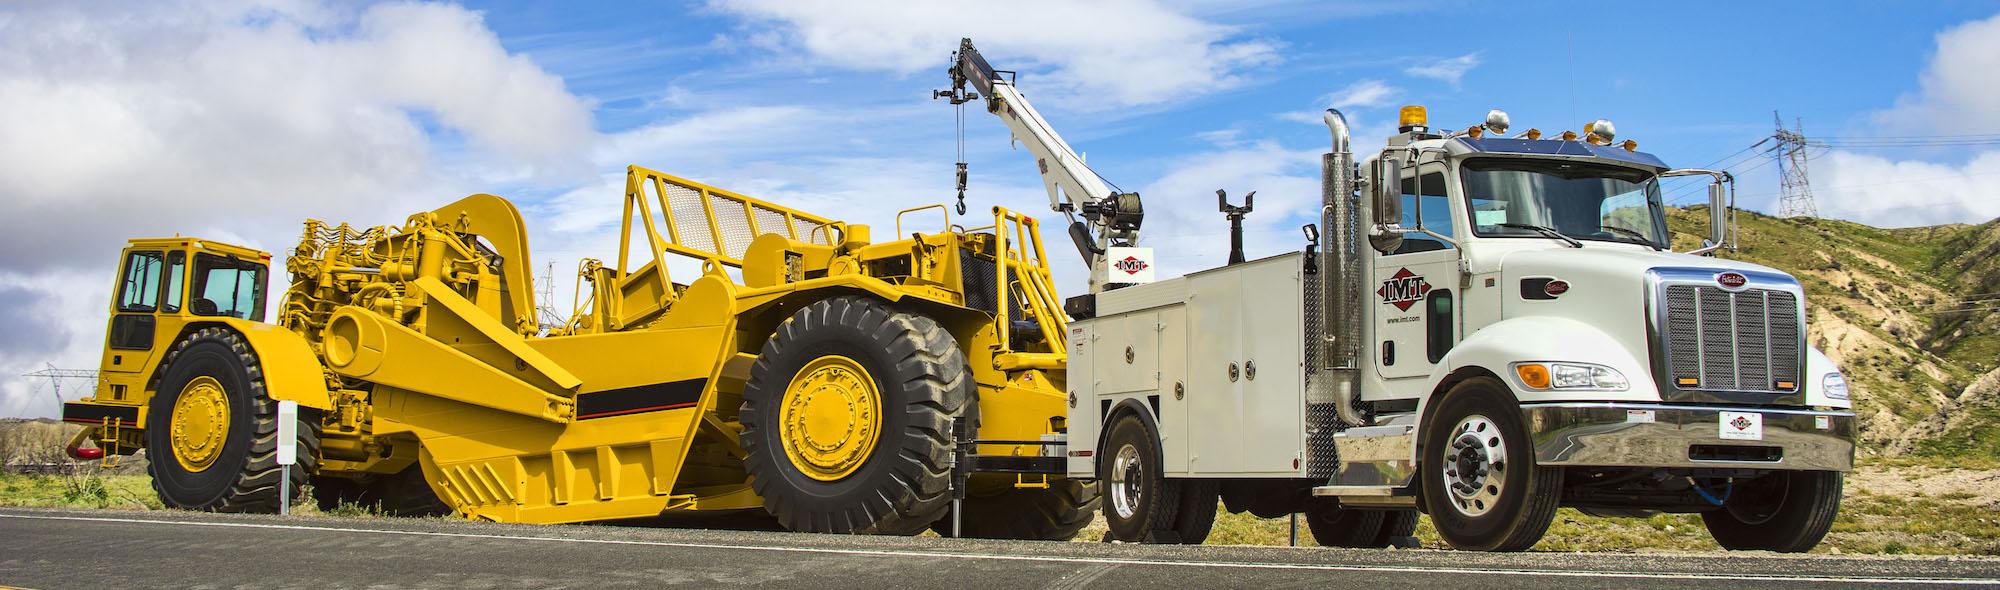 imt-mechanics-truck-2.jpeg